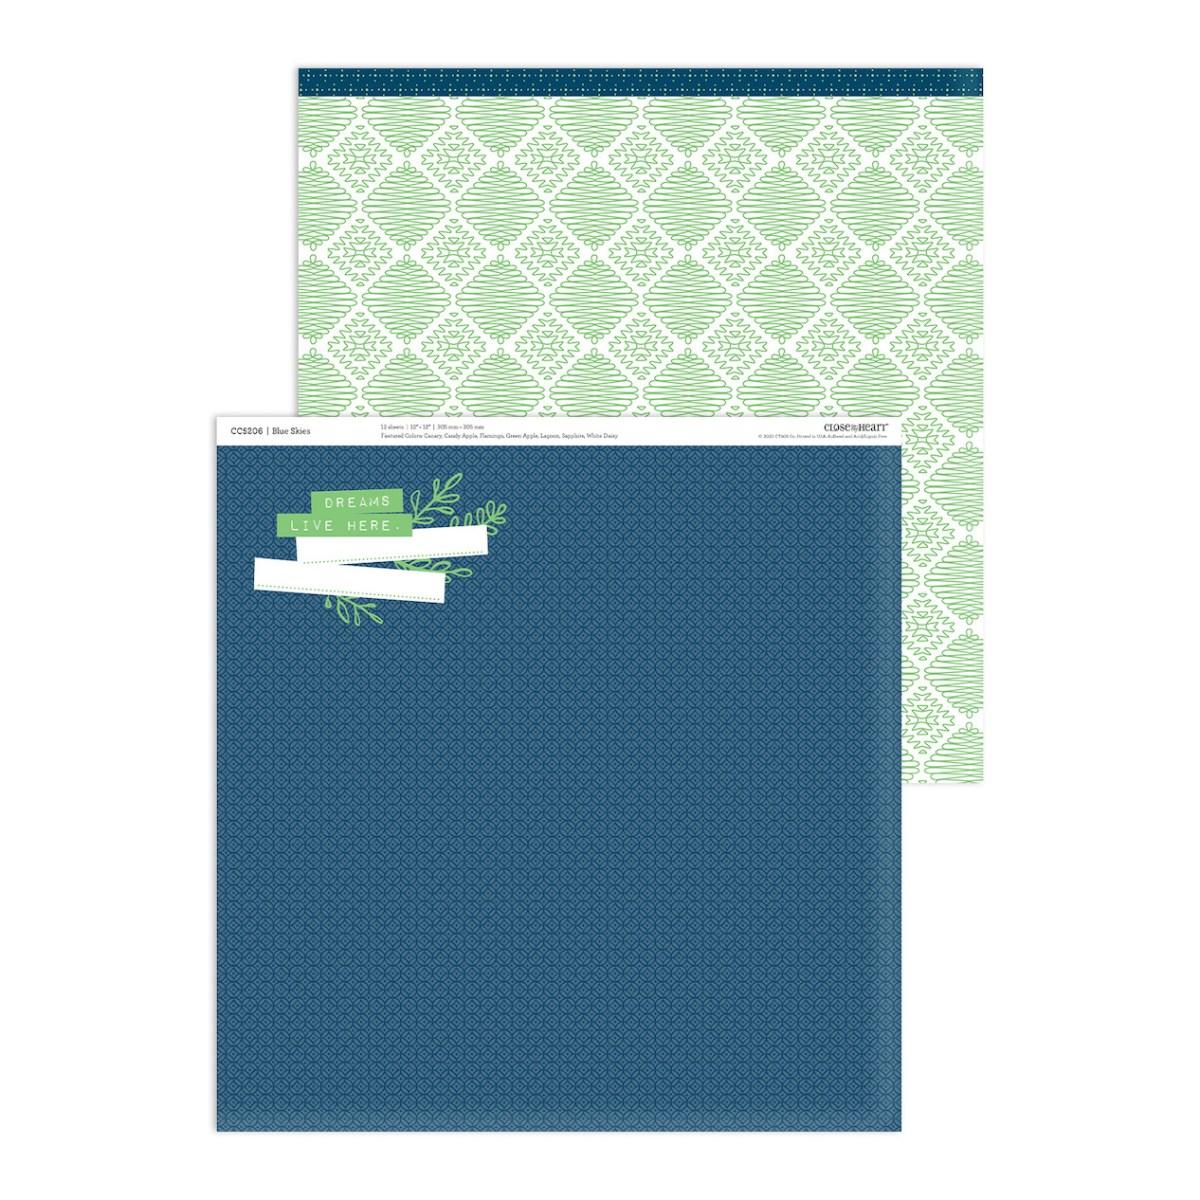 Blue Skies Collection #ctmh #closetomyheart #ctmhblueskies #nationalscrapbookingmonth #nationalscrapbookingday #ctmhnsd #ctmhnsm #scrapbooking #cardmaking #papercrafting #everydaylife #minialbum #cutabove #pinwheel #thincuts #blueskies #beautifulday #giveaway